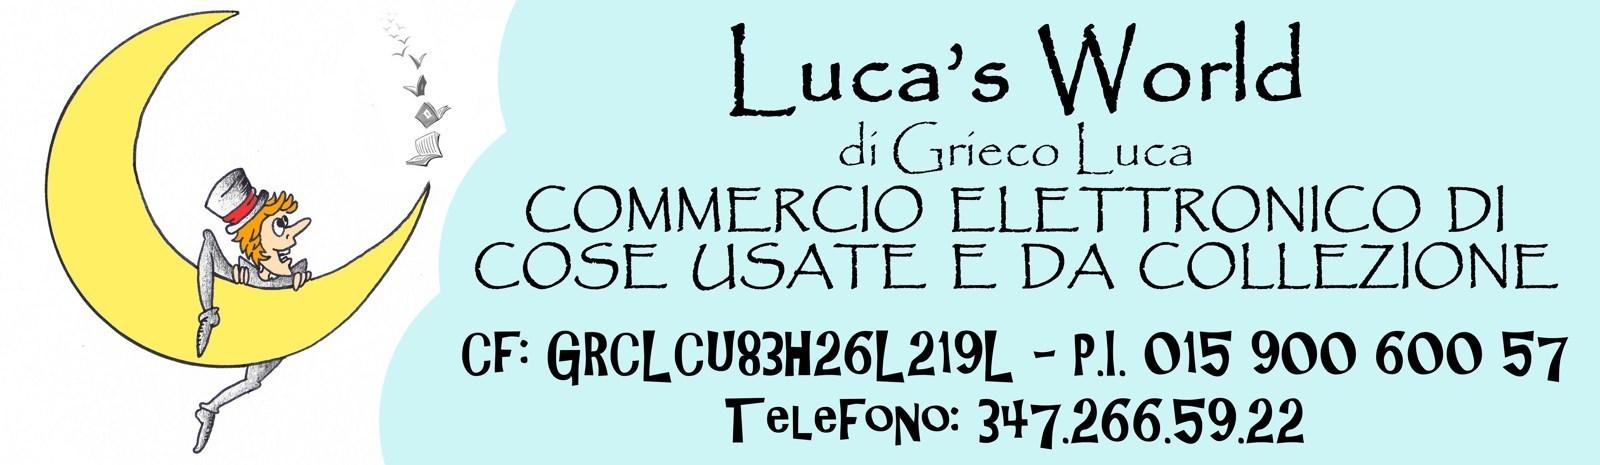 Luca's World di Grieco Luca